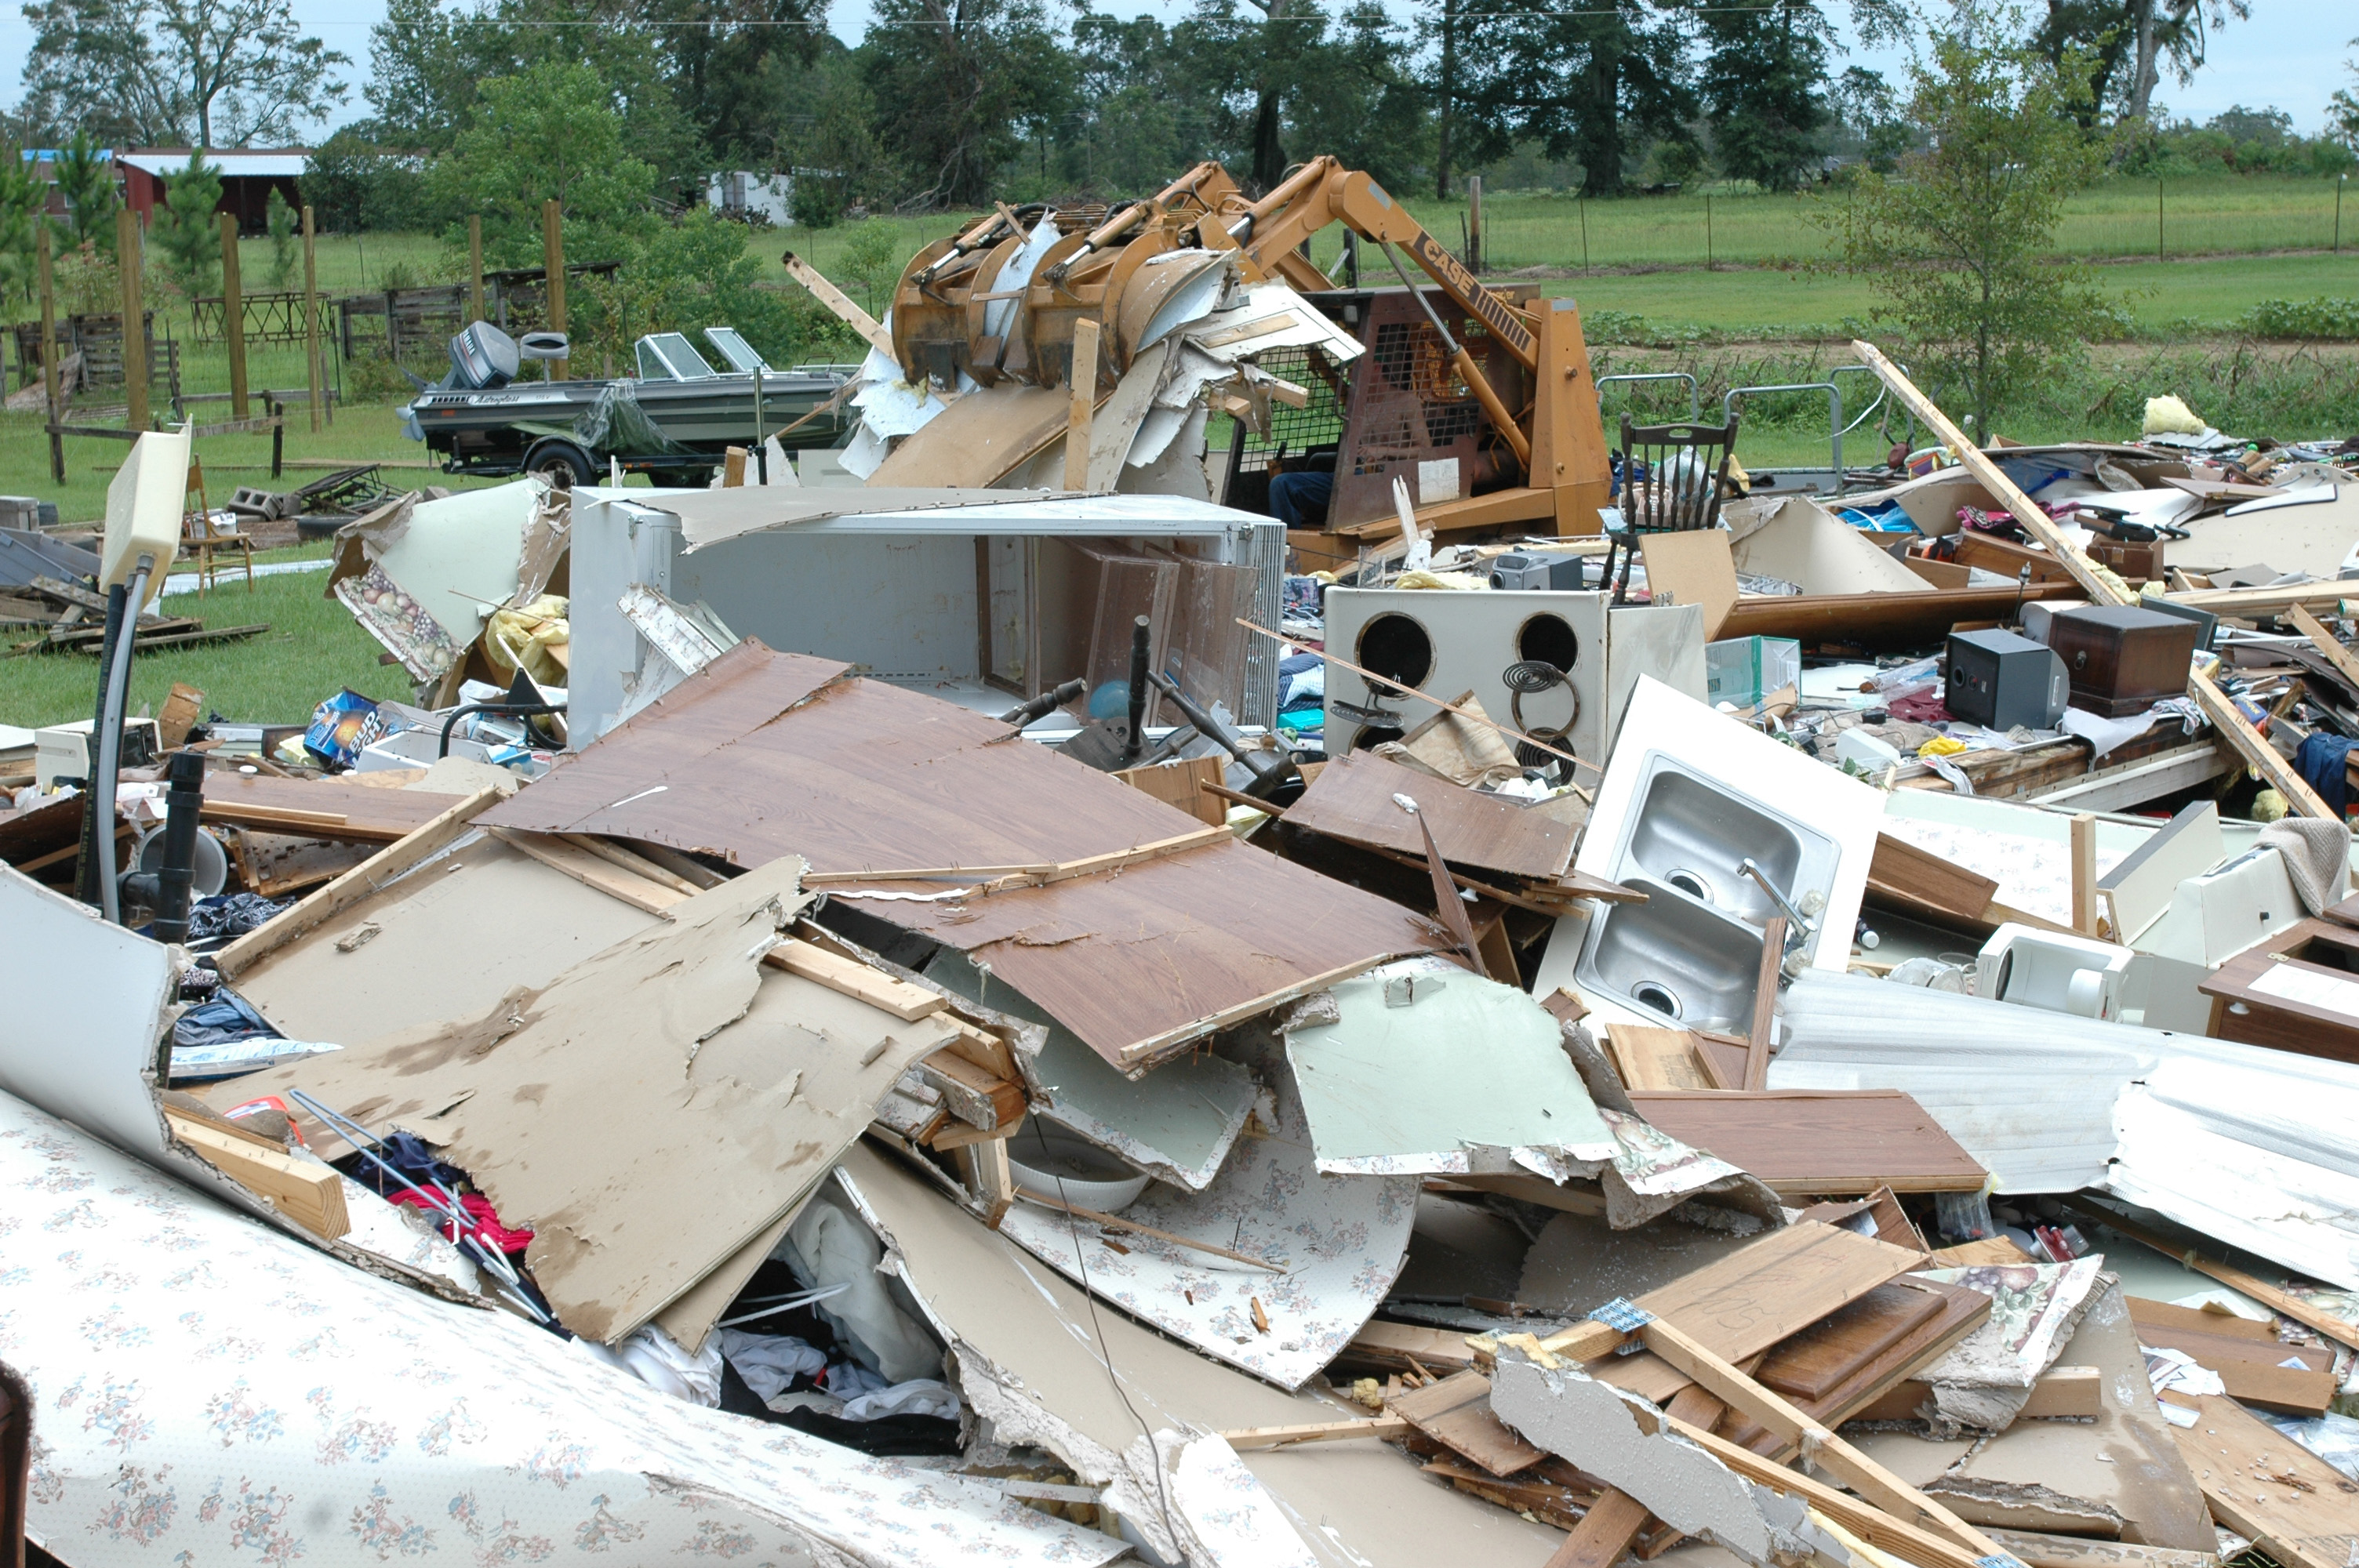 File:House damaged by Hurricane Dennis.jpg - Wikimedia Commons